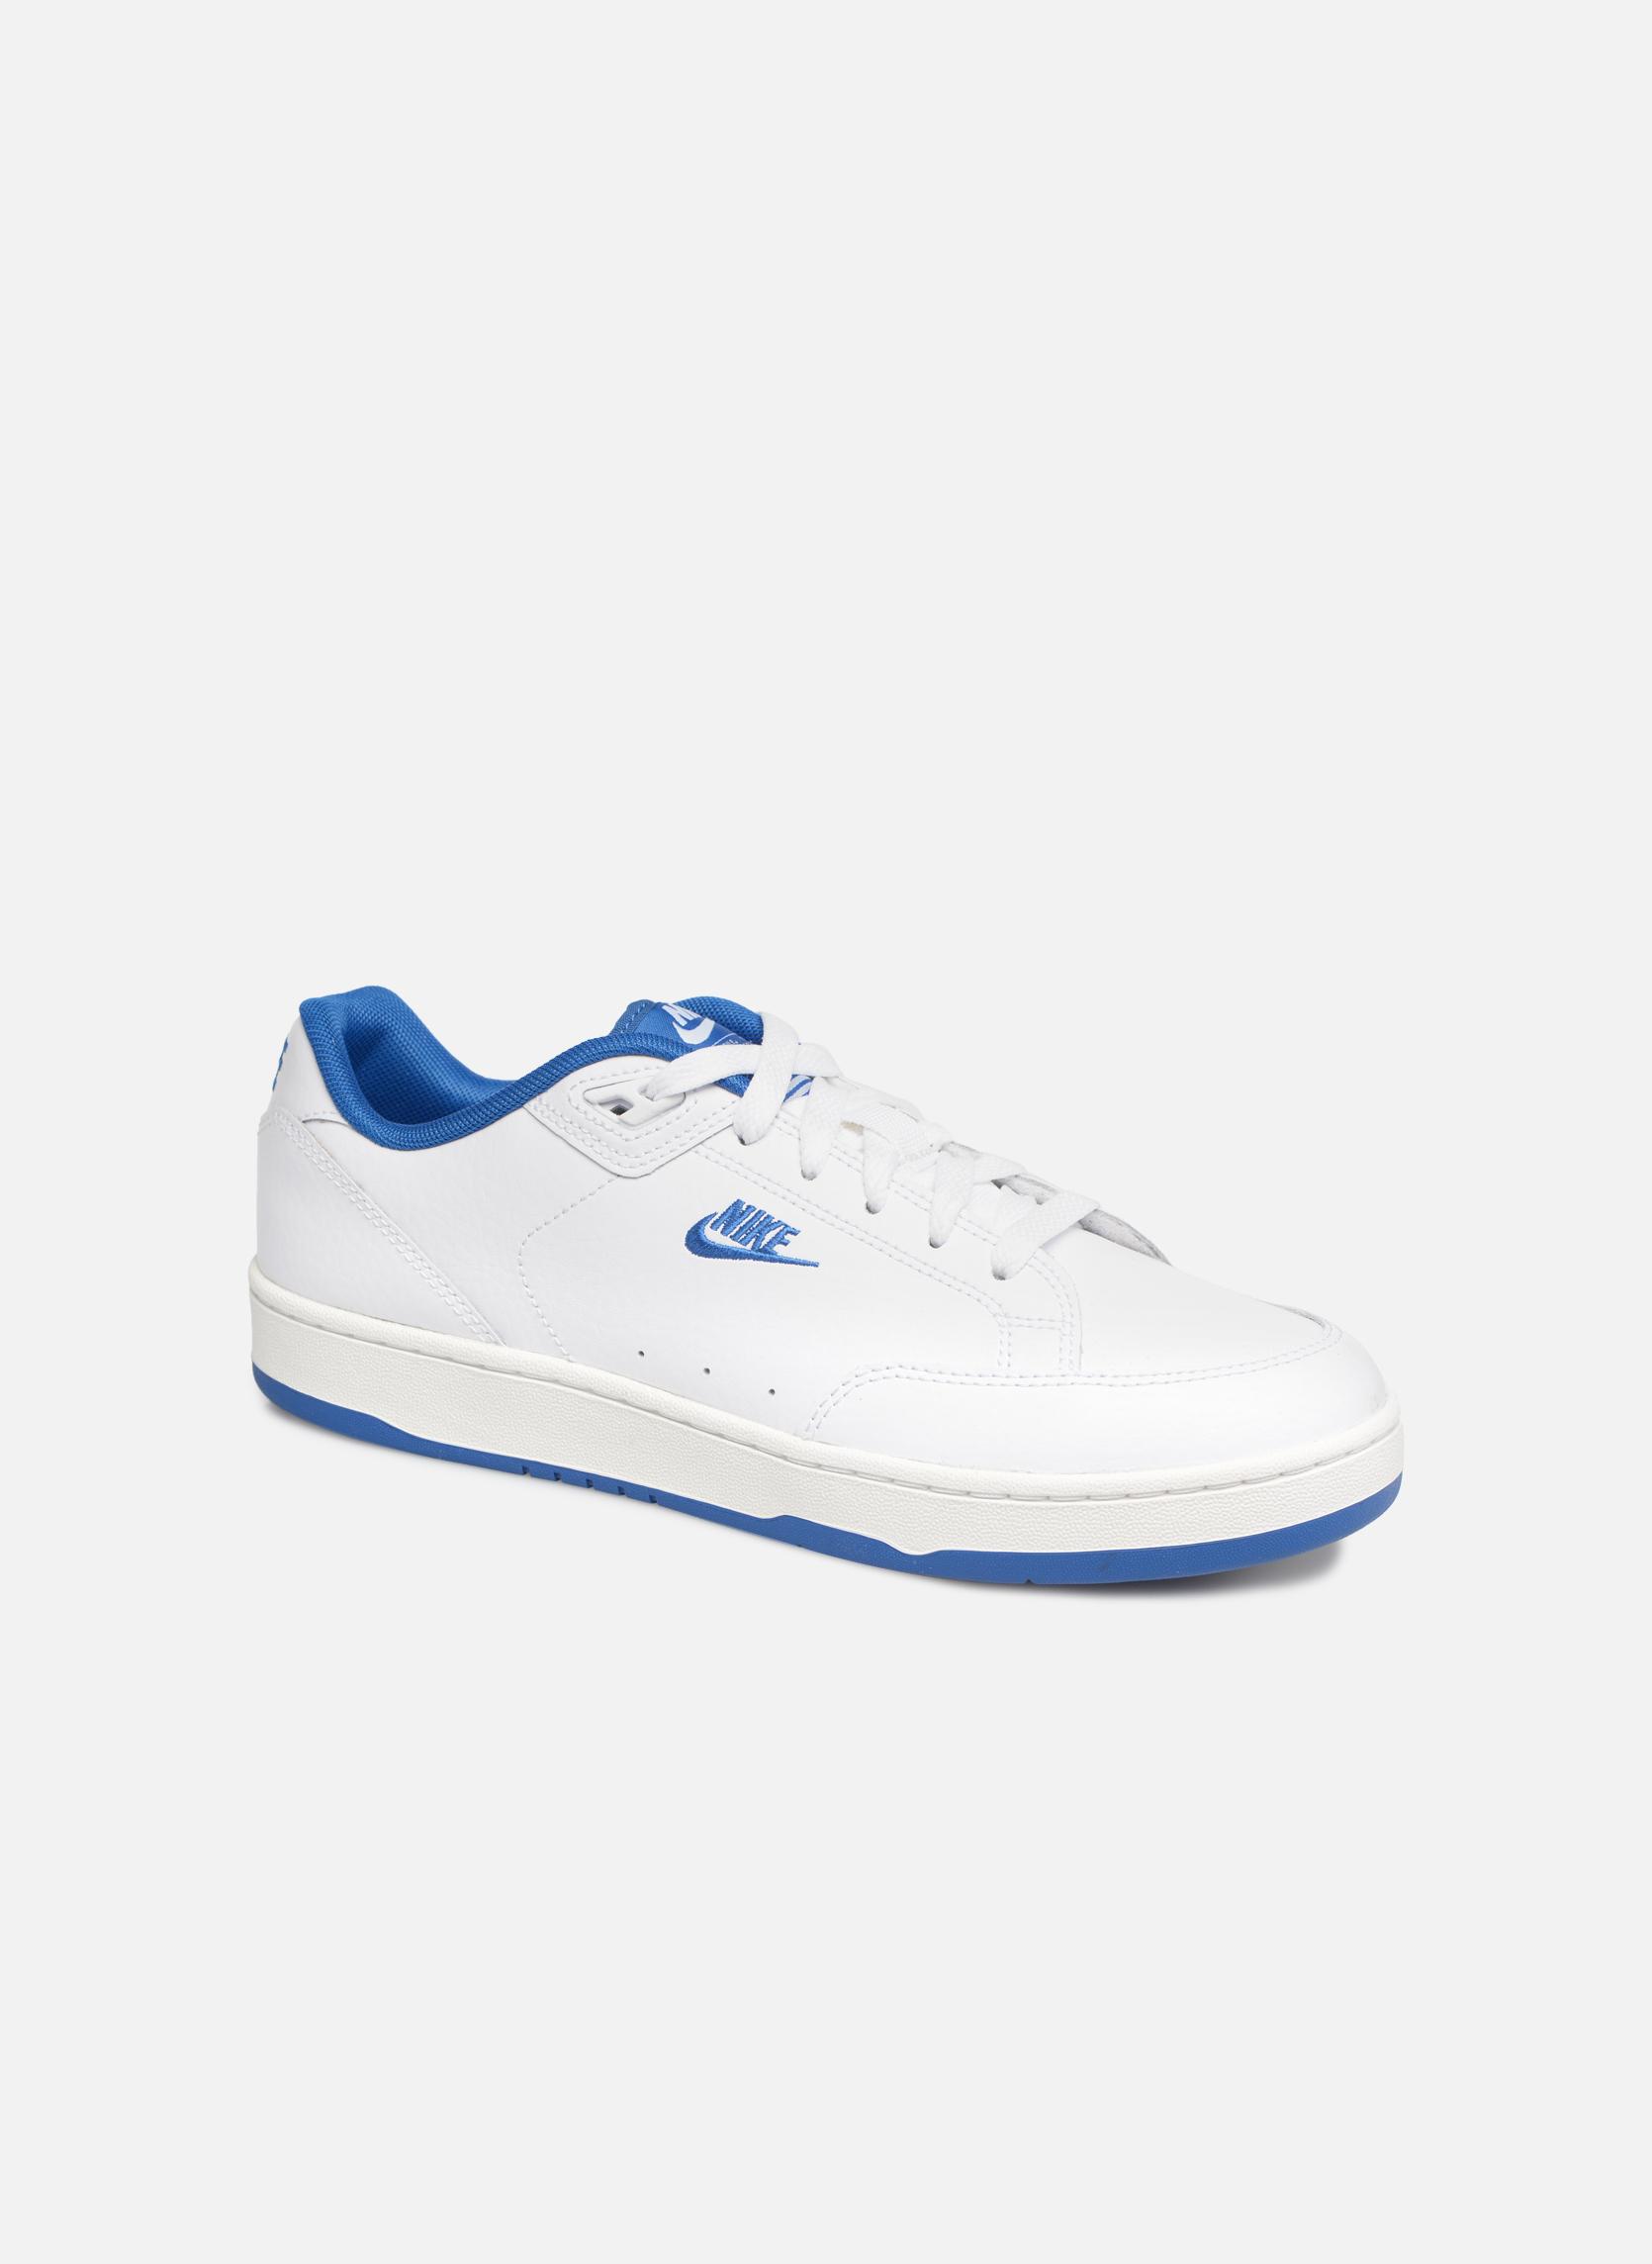 Sneakers Grandstand Ii by Nike